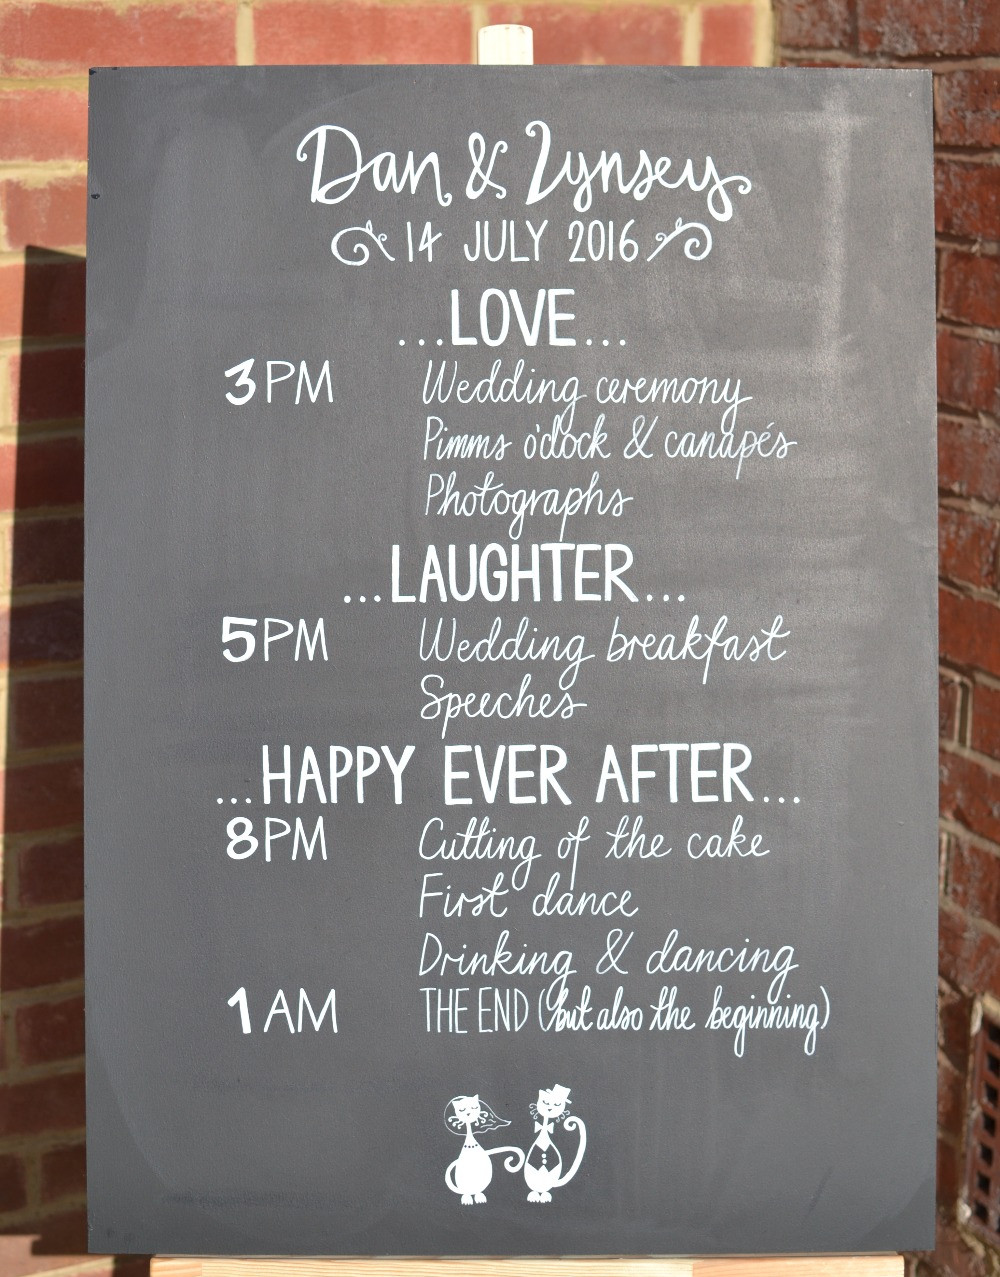 Dan & Lynsey Chalkboards - July 2016 (11)_edited